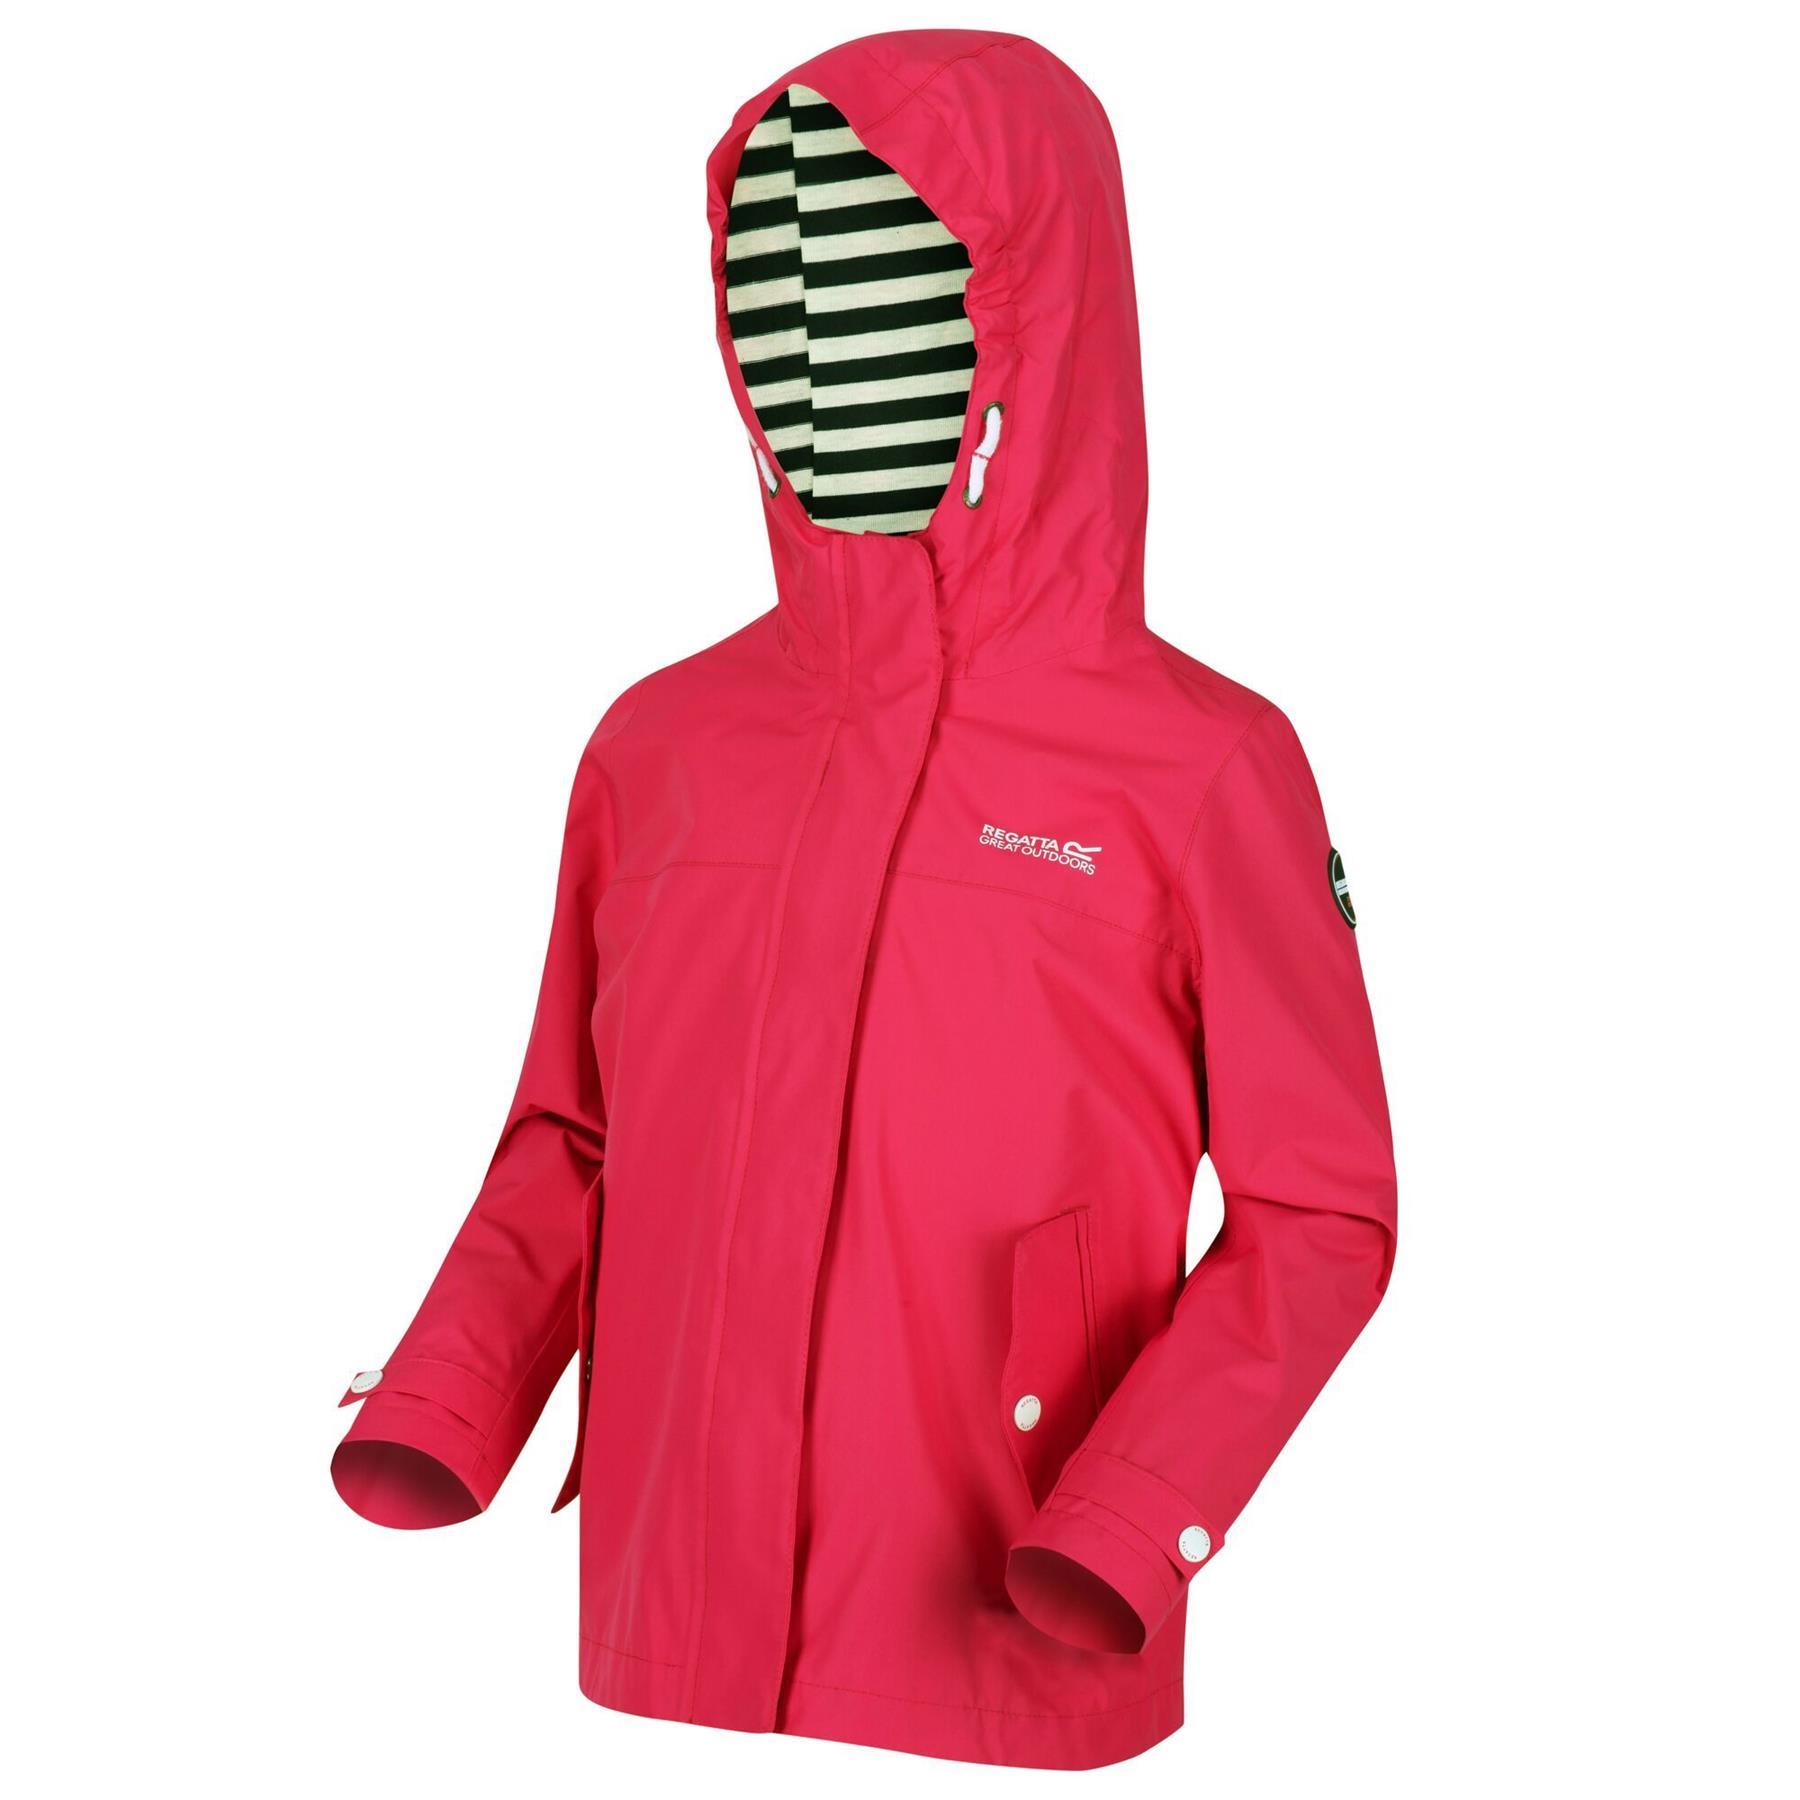 miniatuur 4 - Regatta Kids Bibiana Waterproof Hooded Zip Jacket Girls Boys Rain Coat